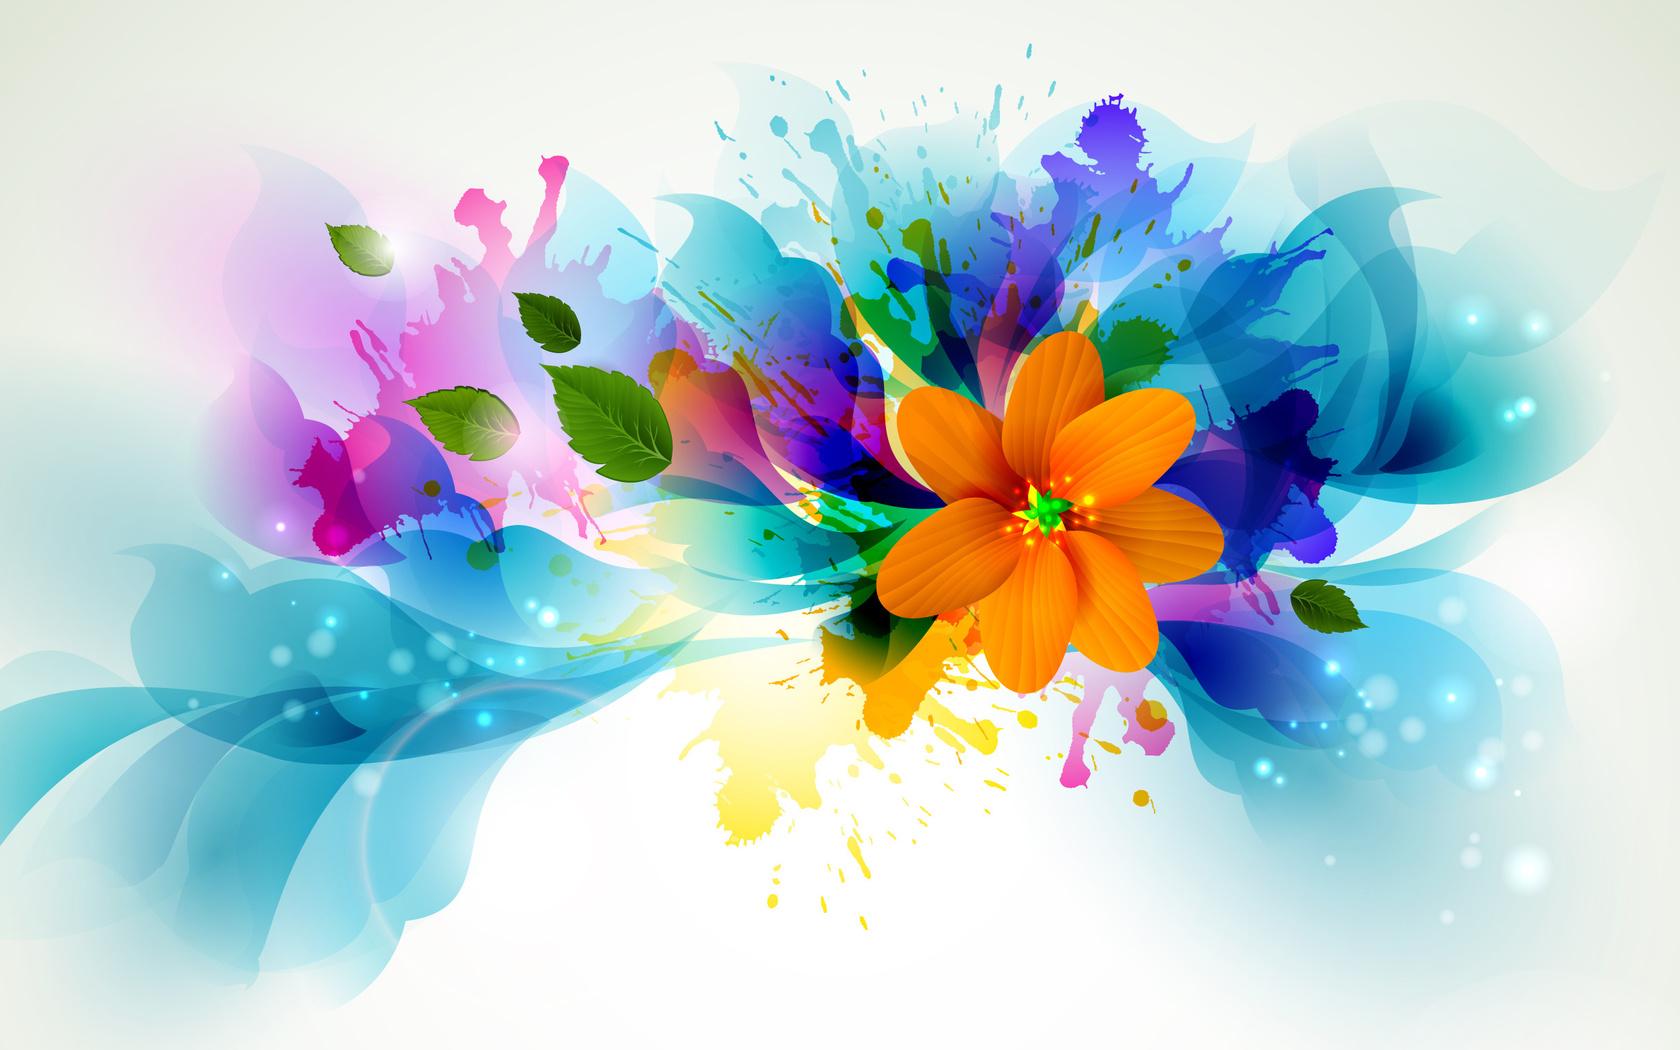 бар картинка яркая веселая цветок того